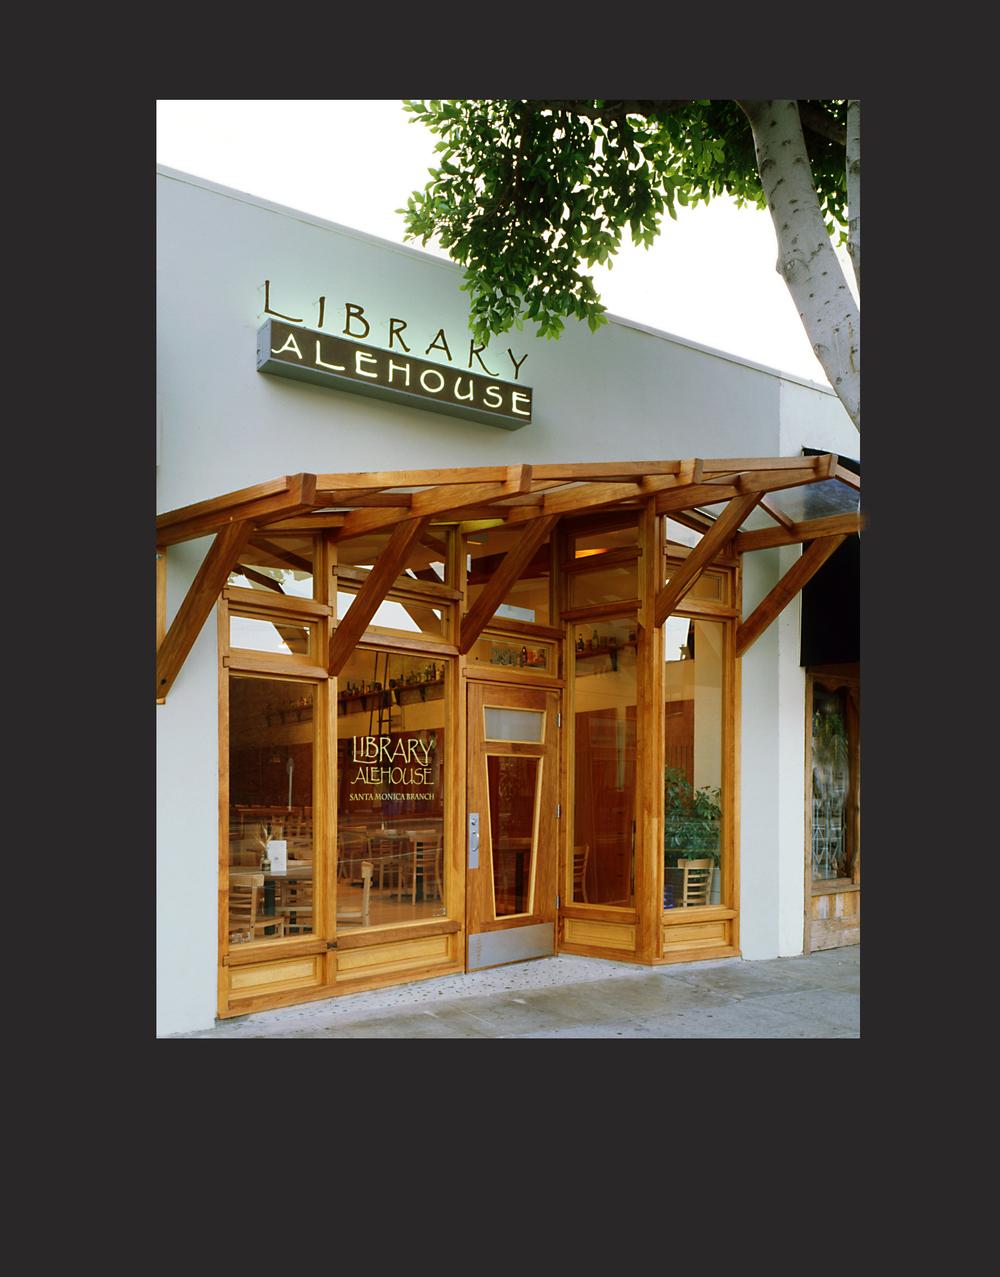 Library Alehouse Santa Monica Main Street elevation                   images © joshua white photography